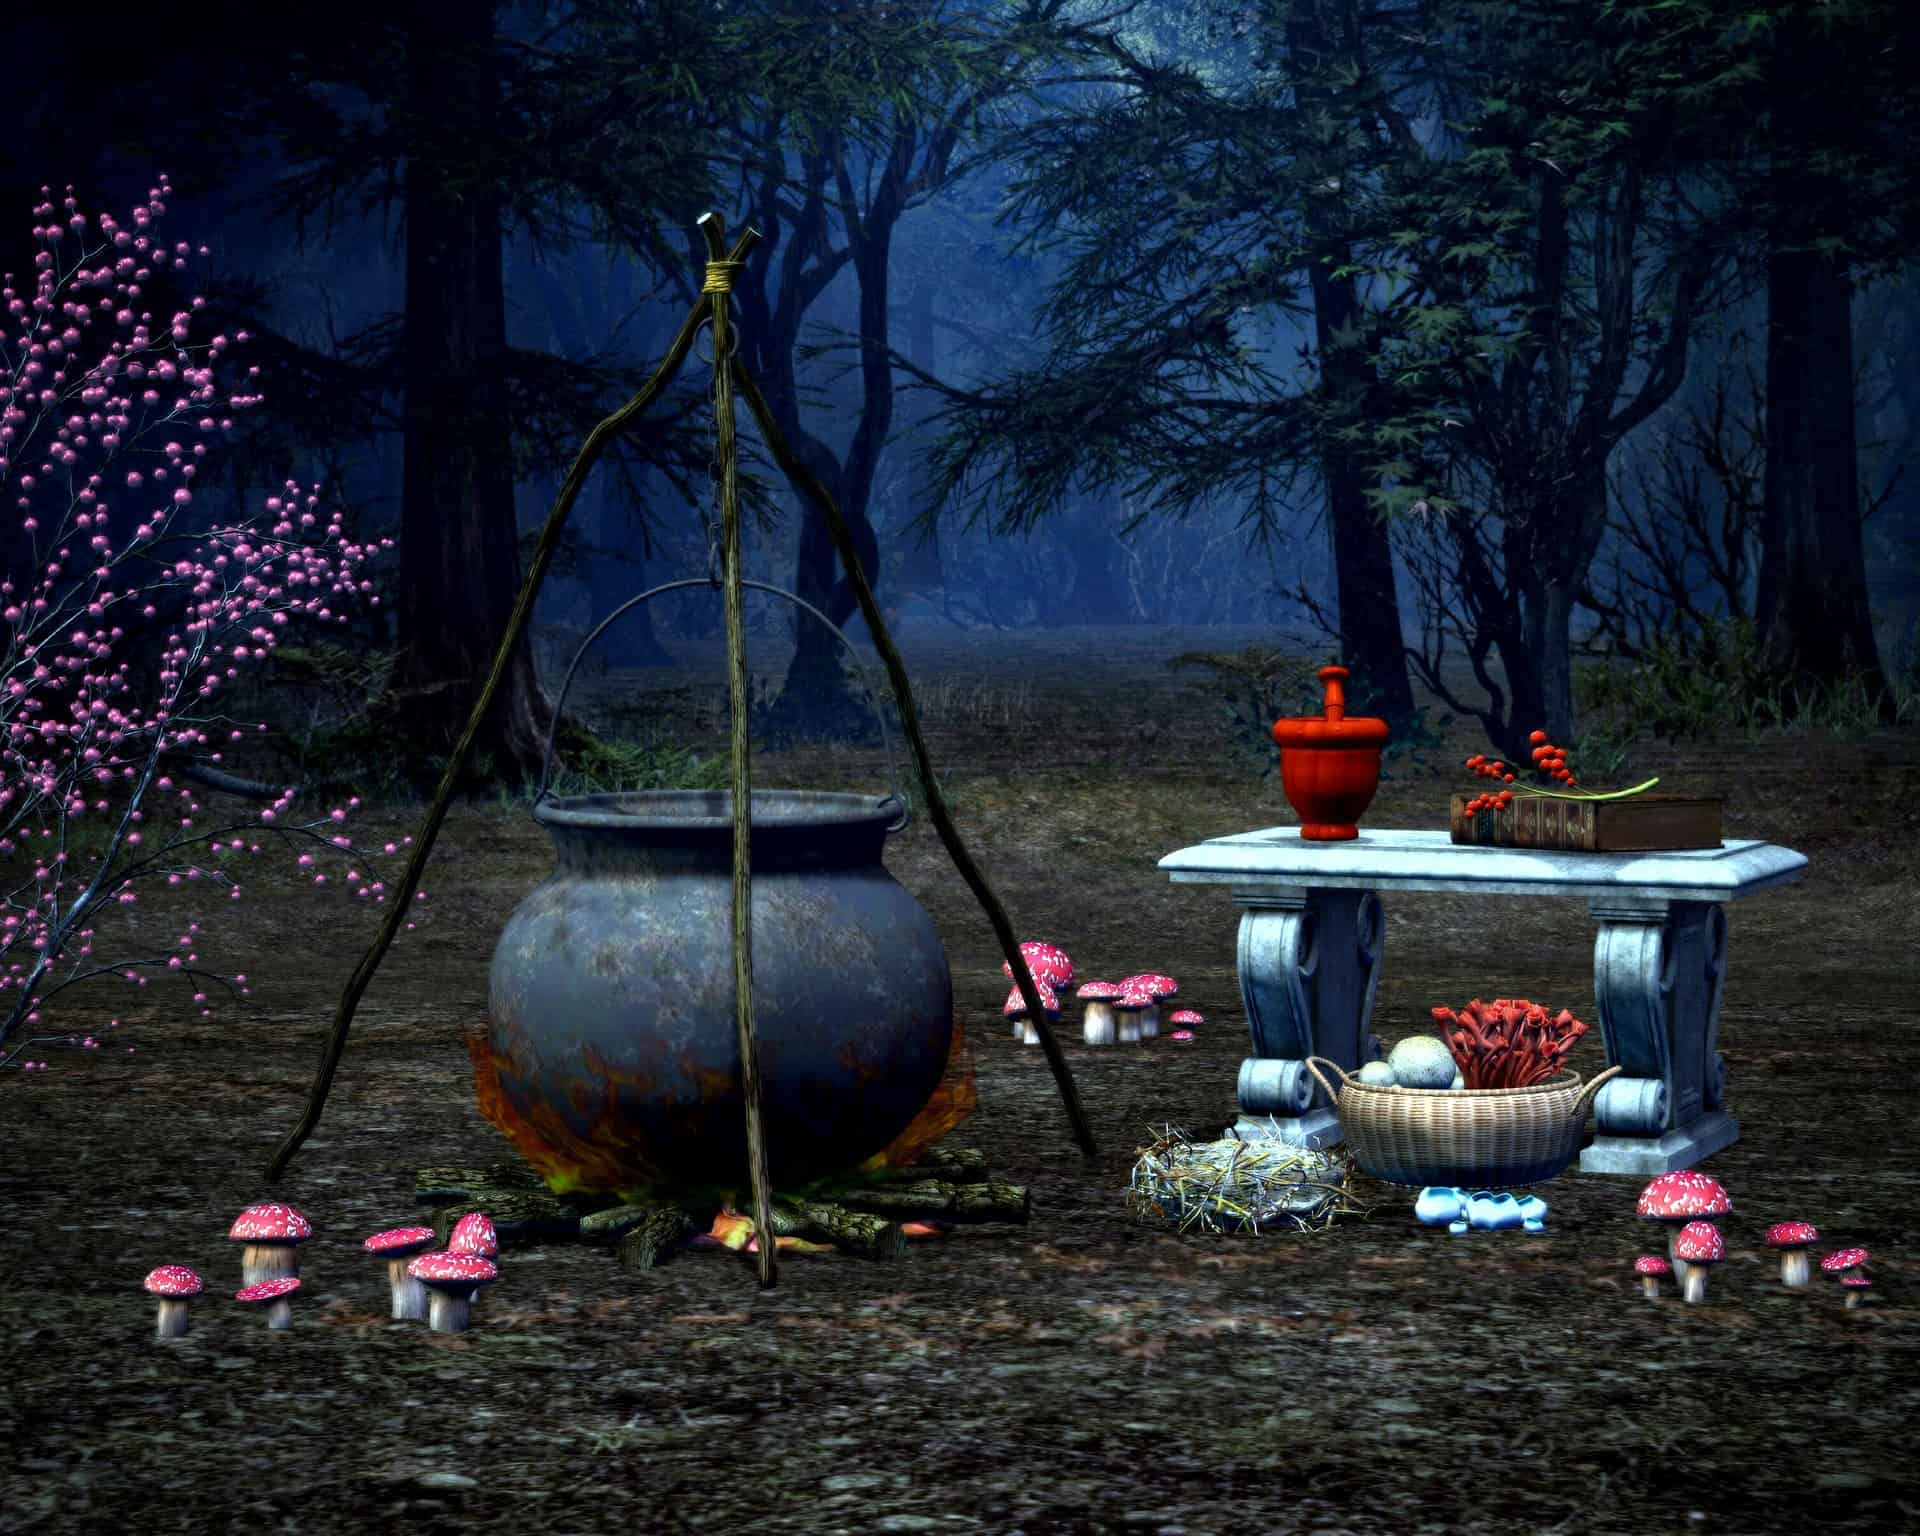 Triora, un borgo magico tra leggende e stregoneria